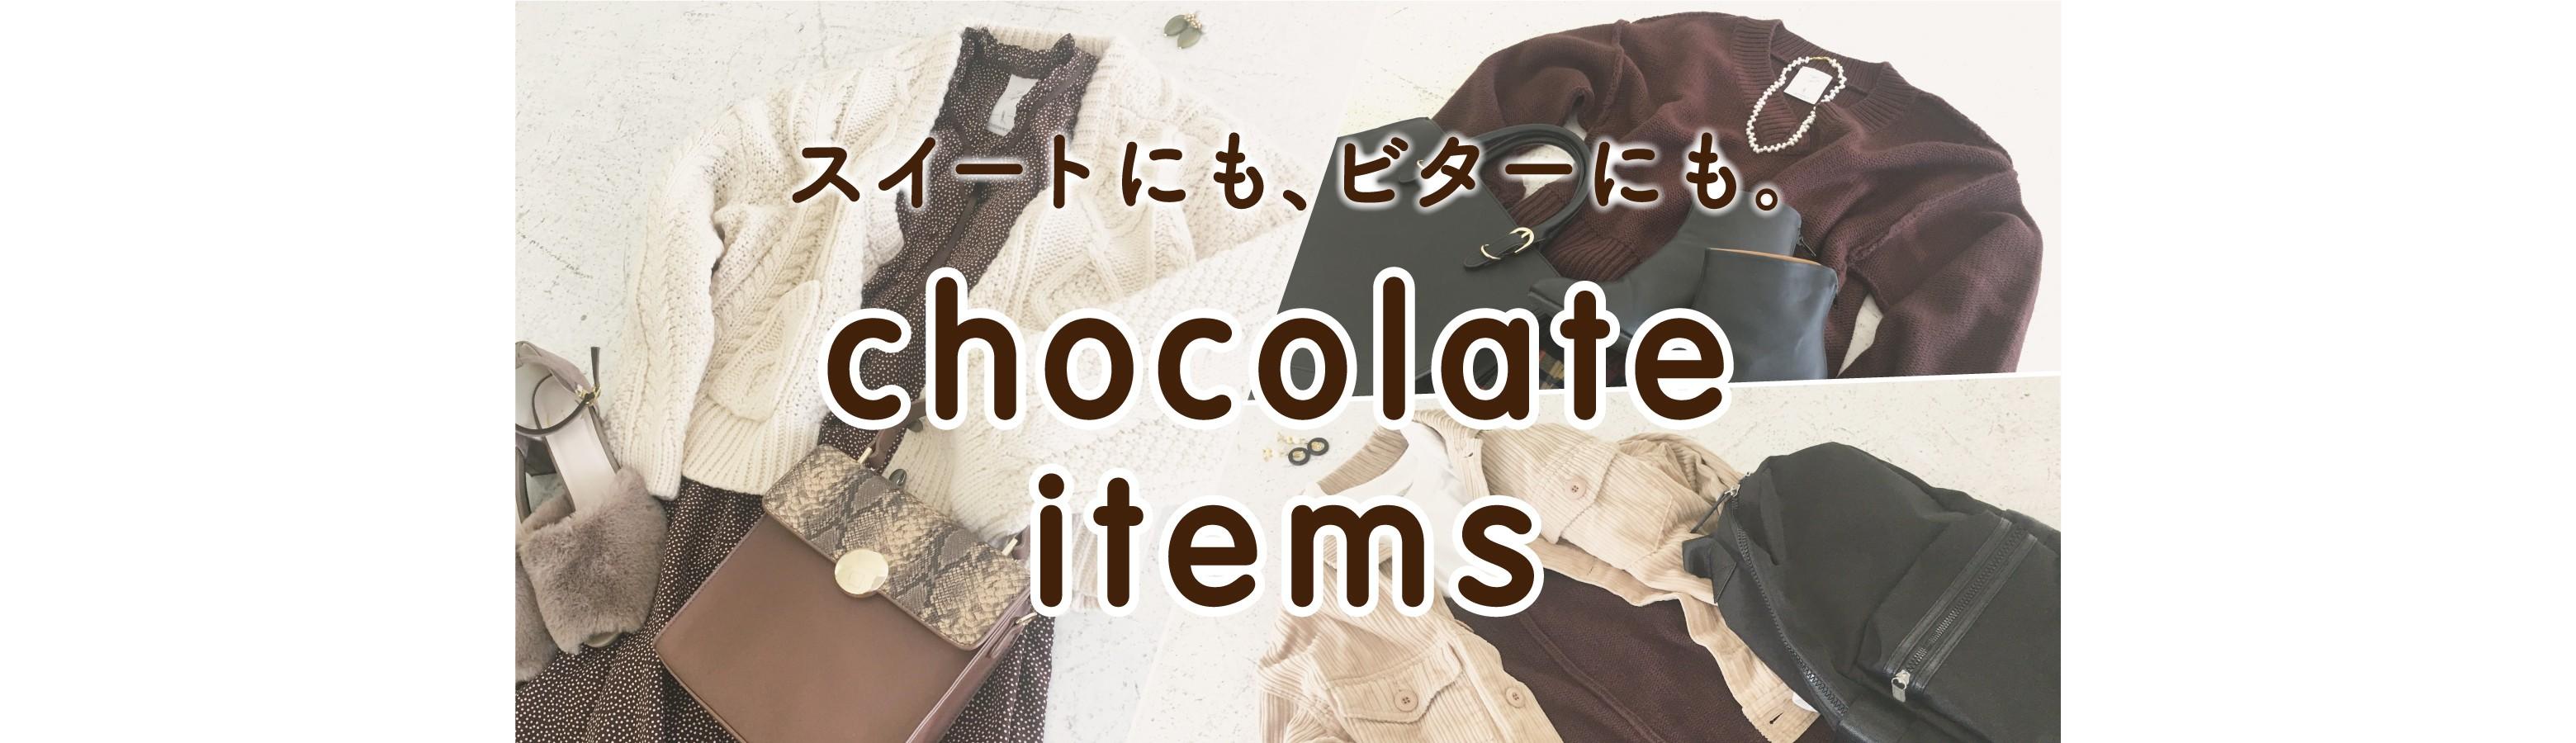 chocolate items